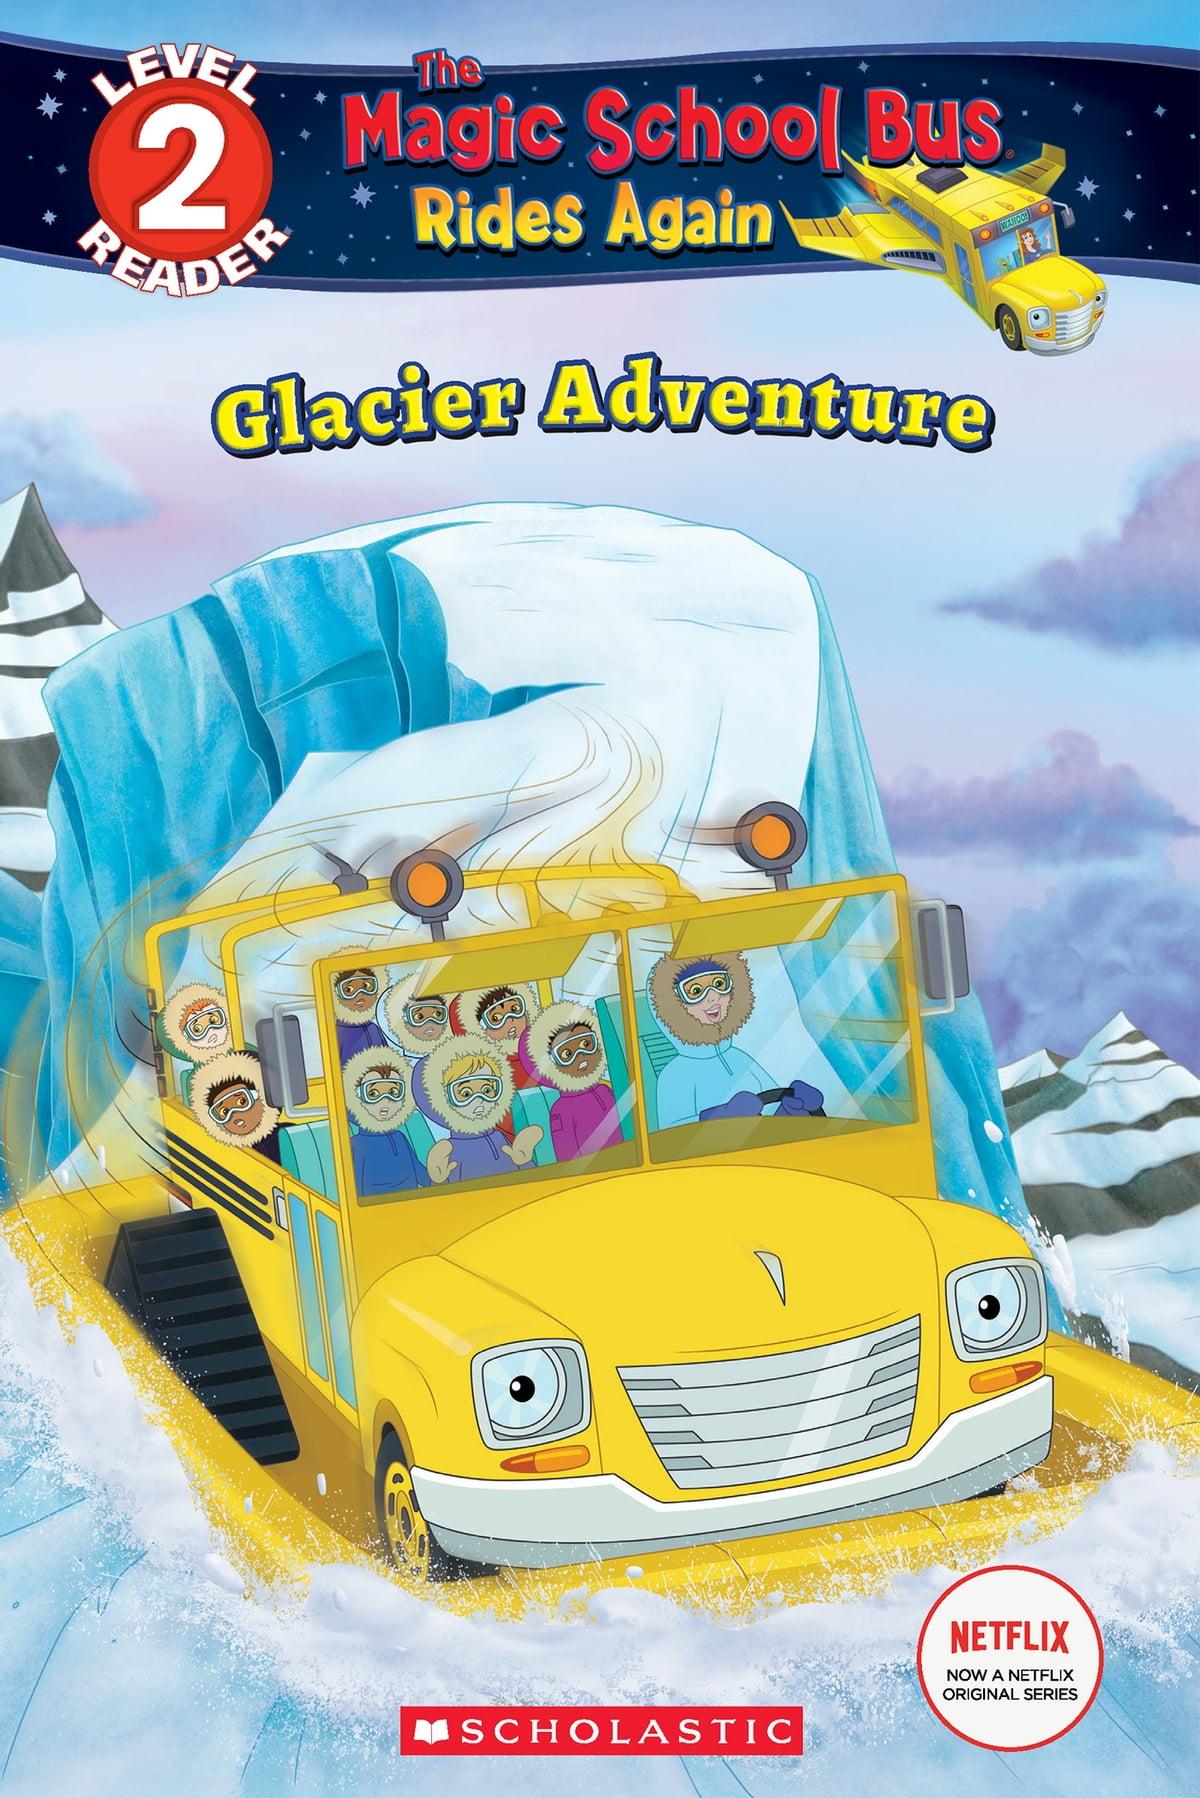 Glacier Adventure The Magic School Bus Rides Again